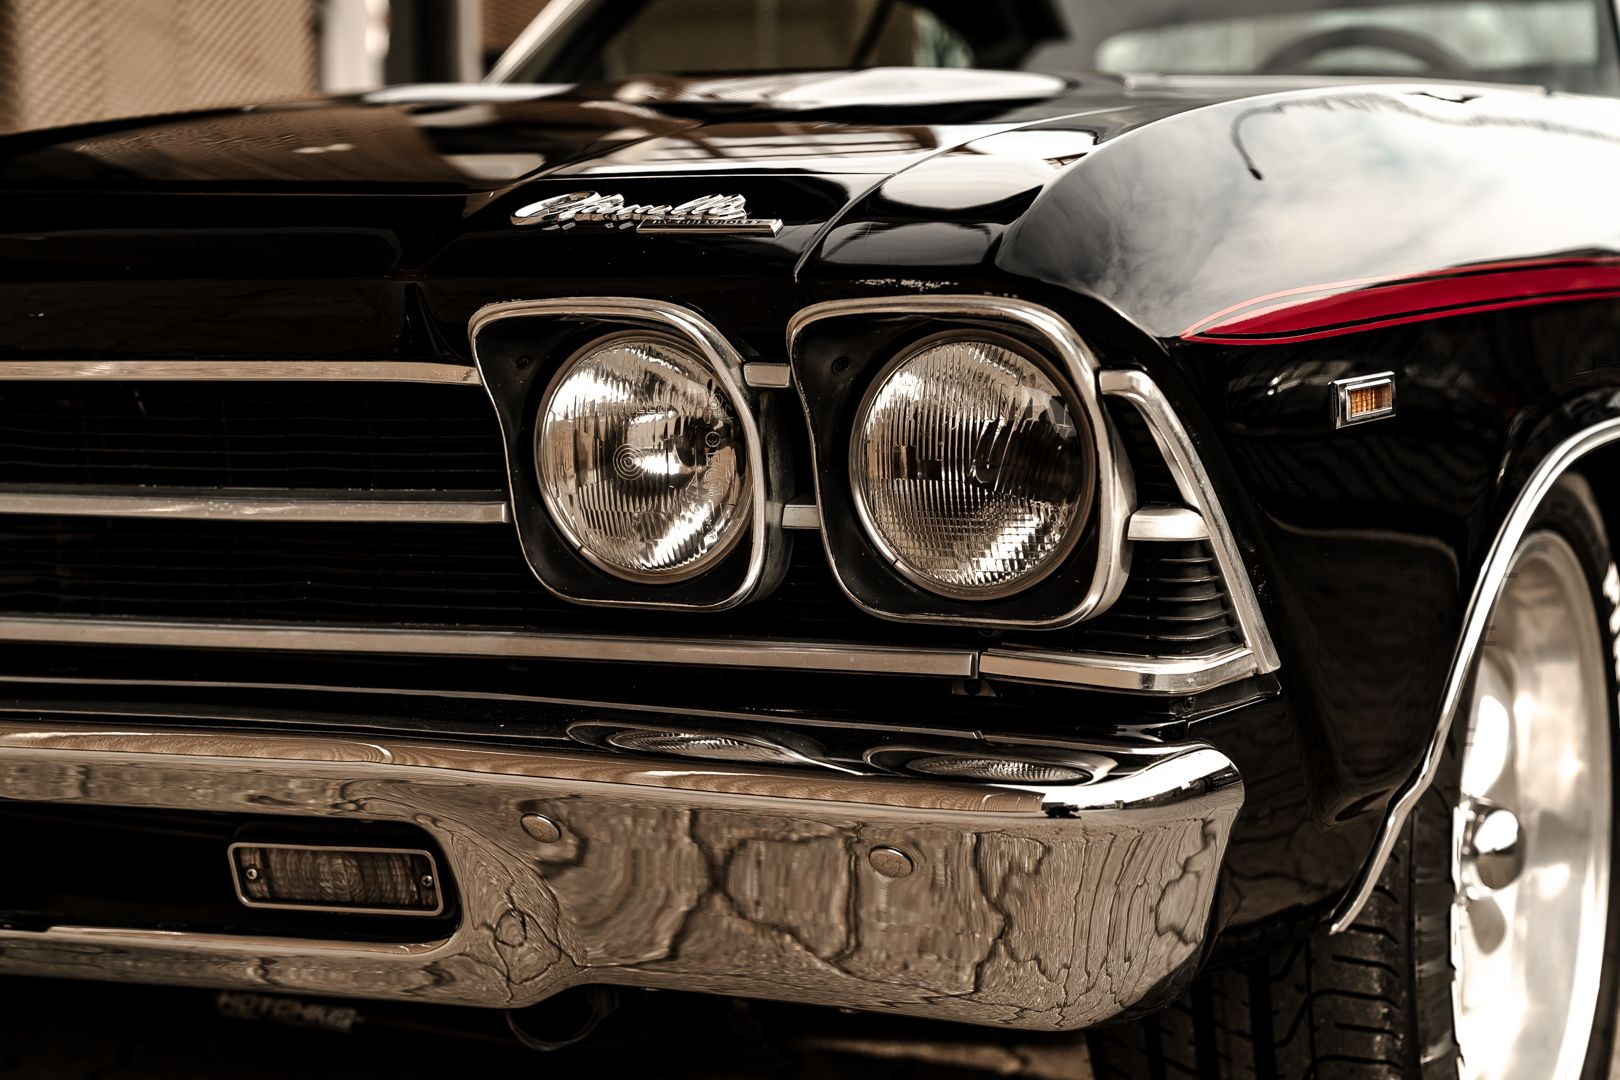 1969 Chevrolet Chevelle SS 62967